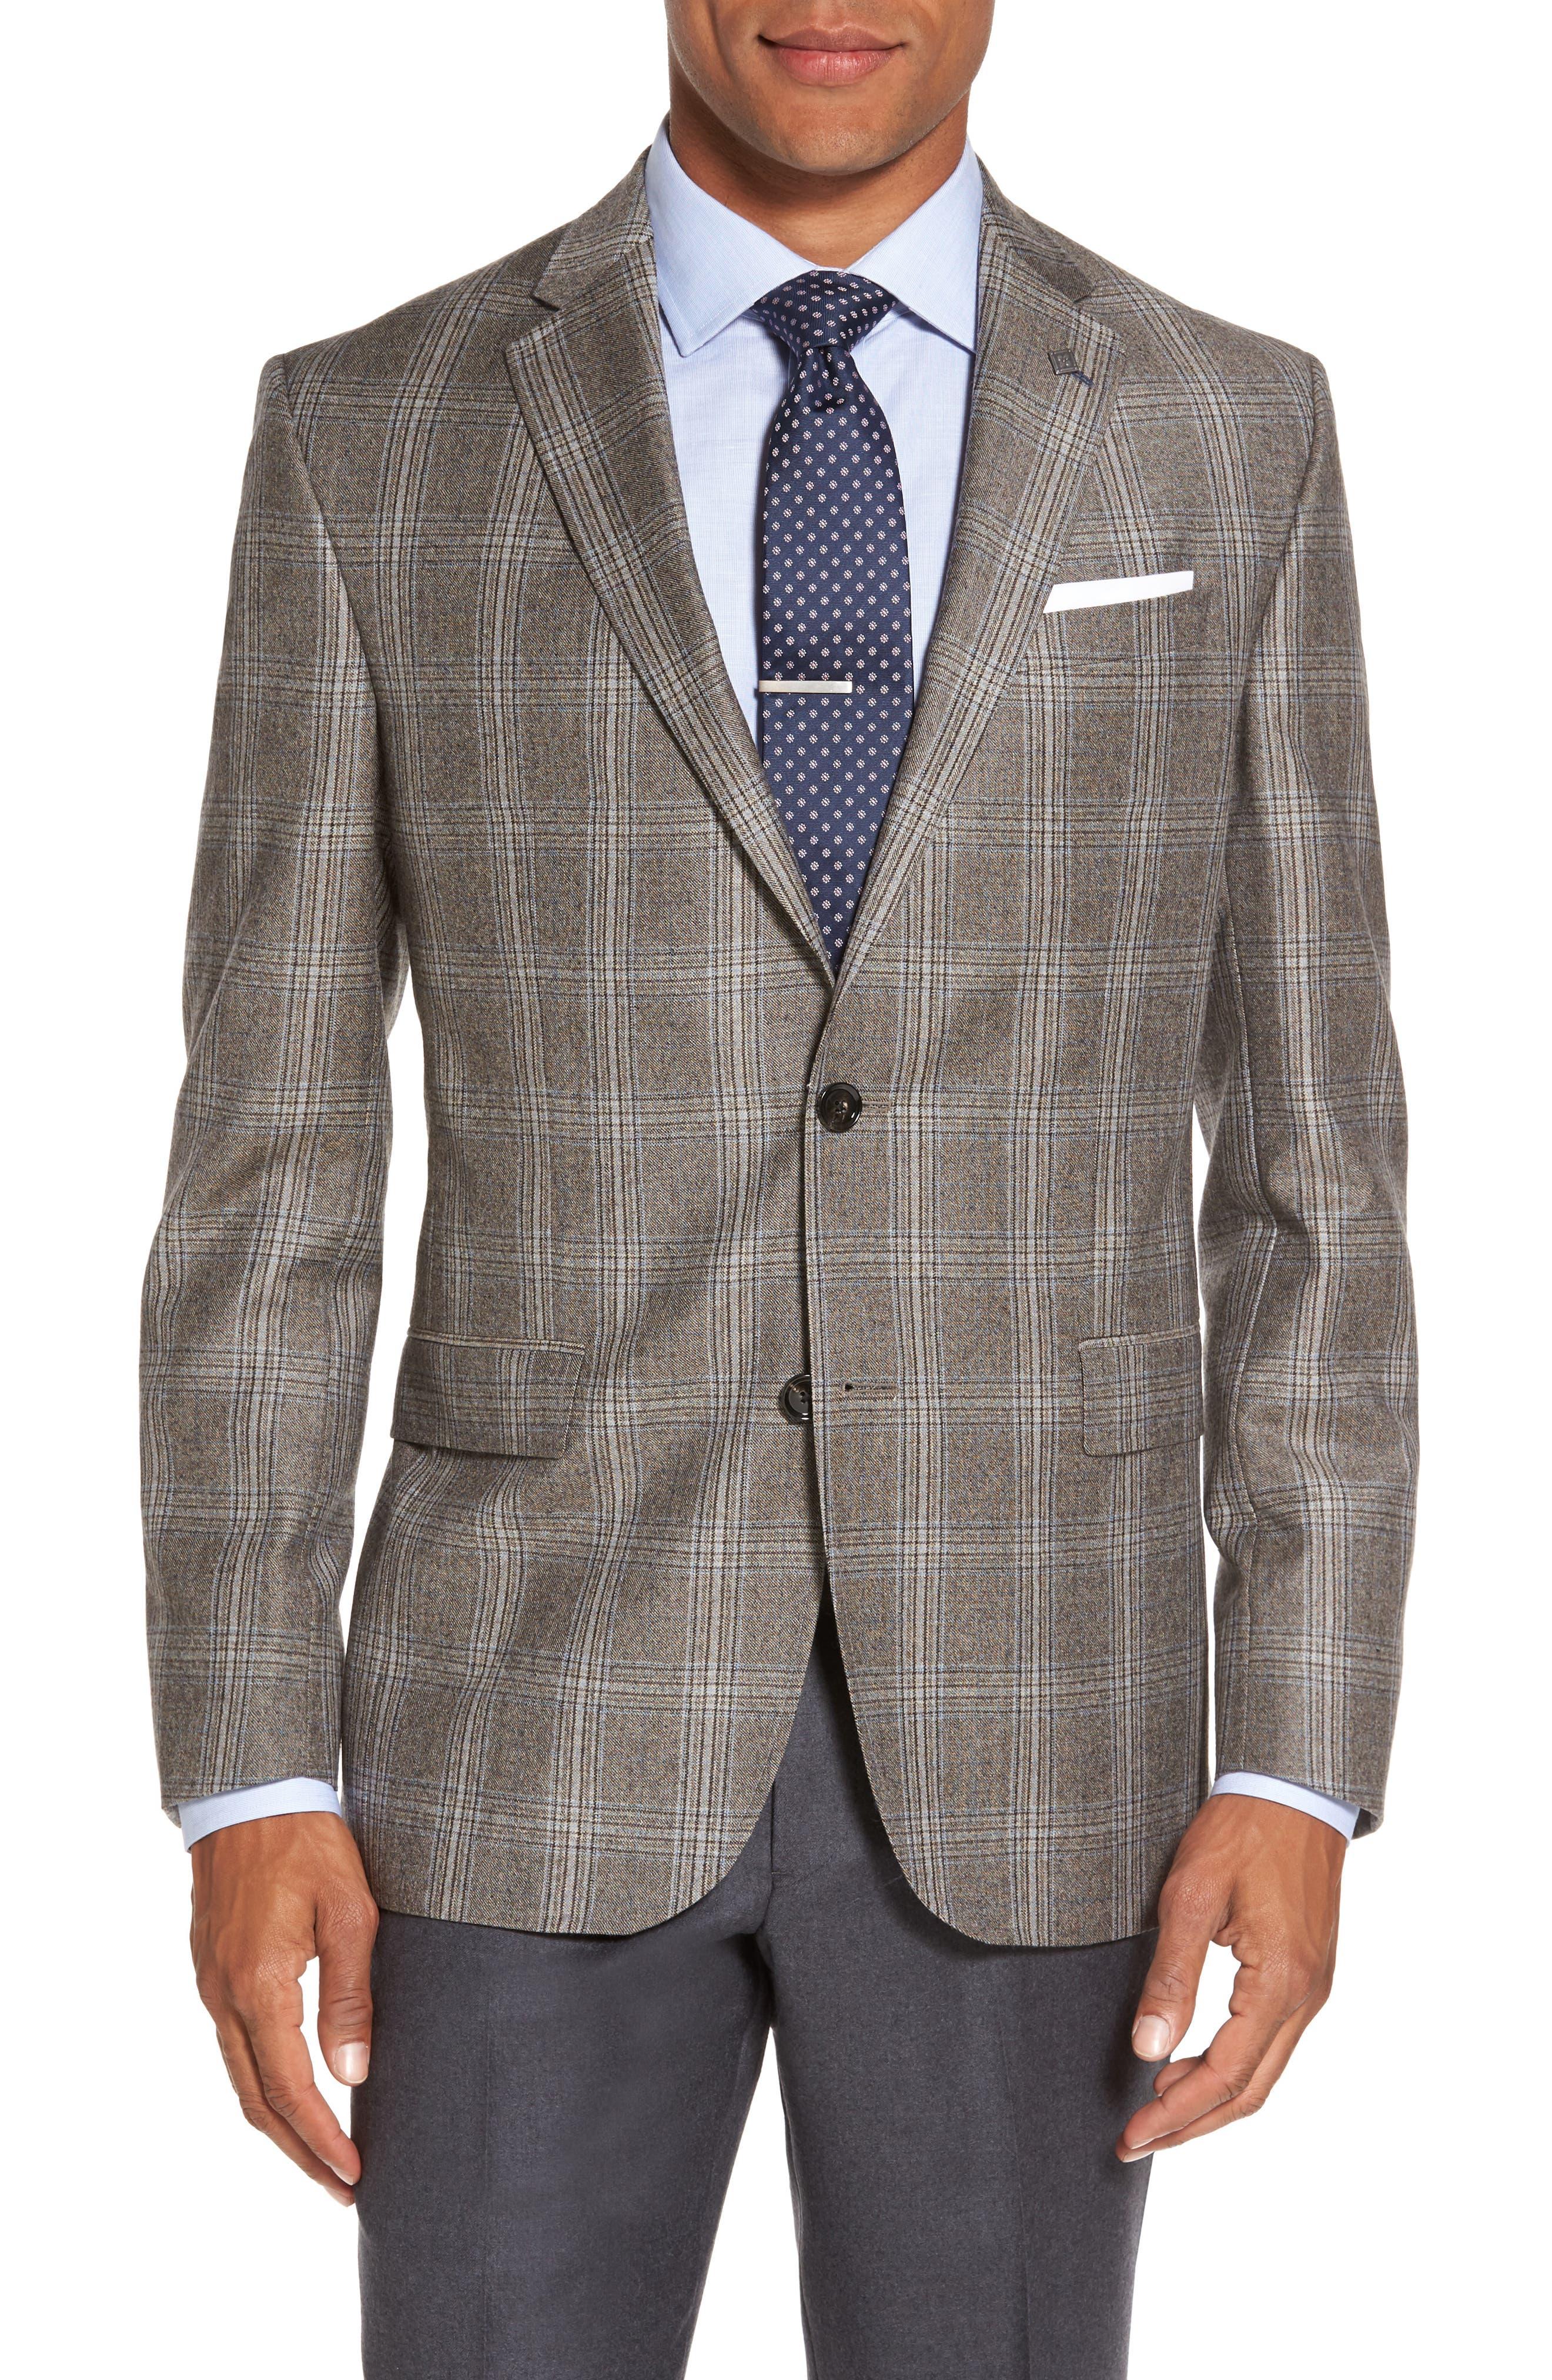 Jay Trim Fit Plaid Wool Sport Coat,                         Main,                         color, Light Brown